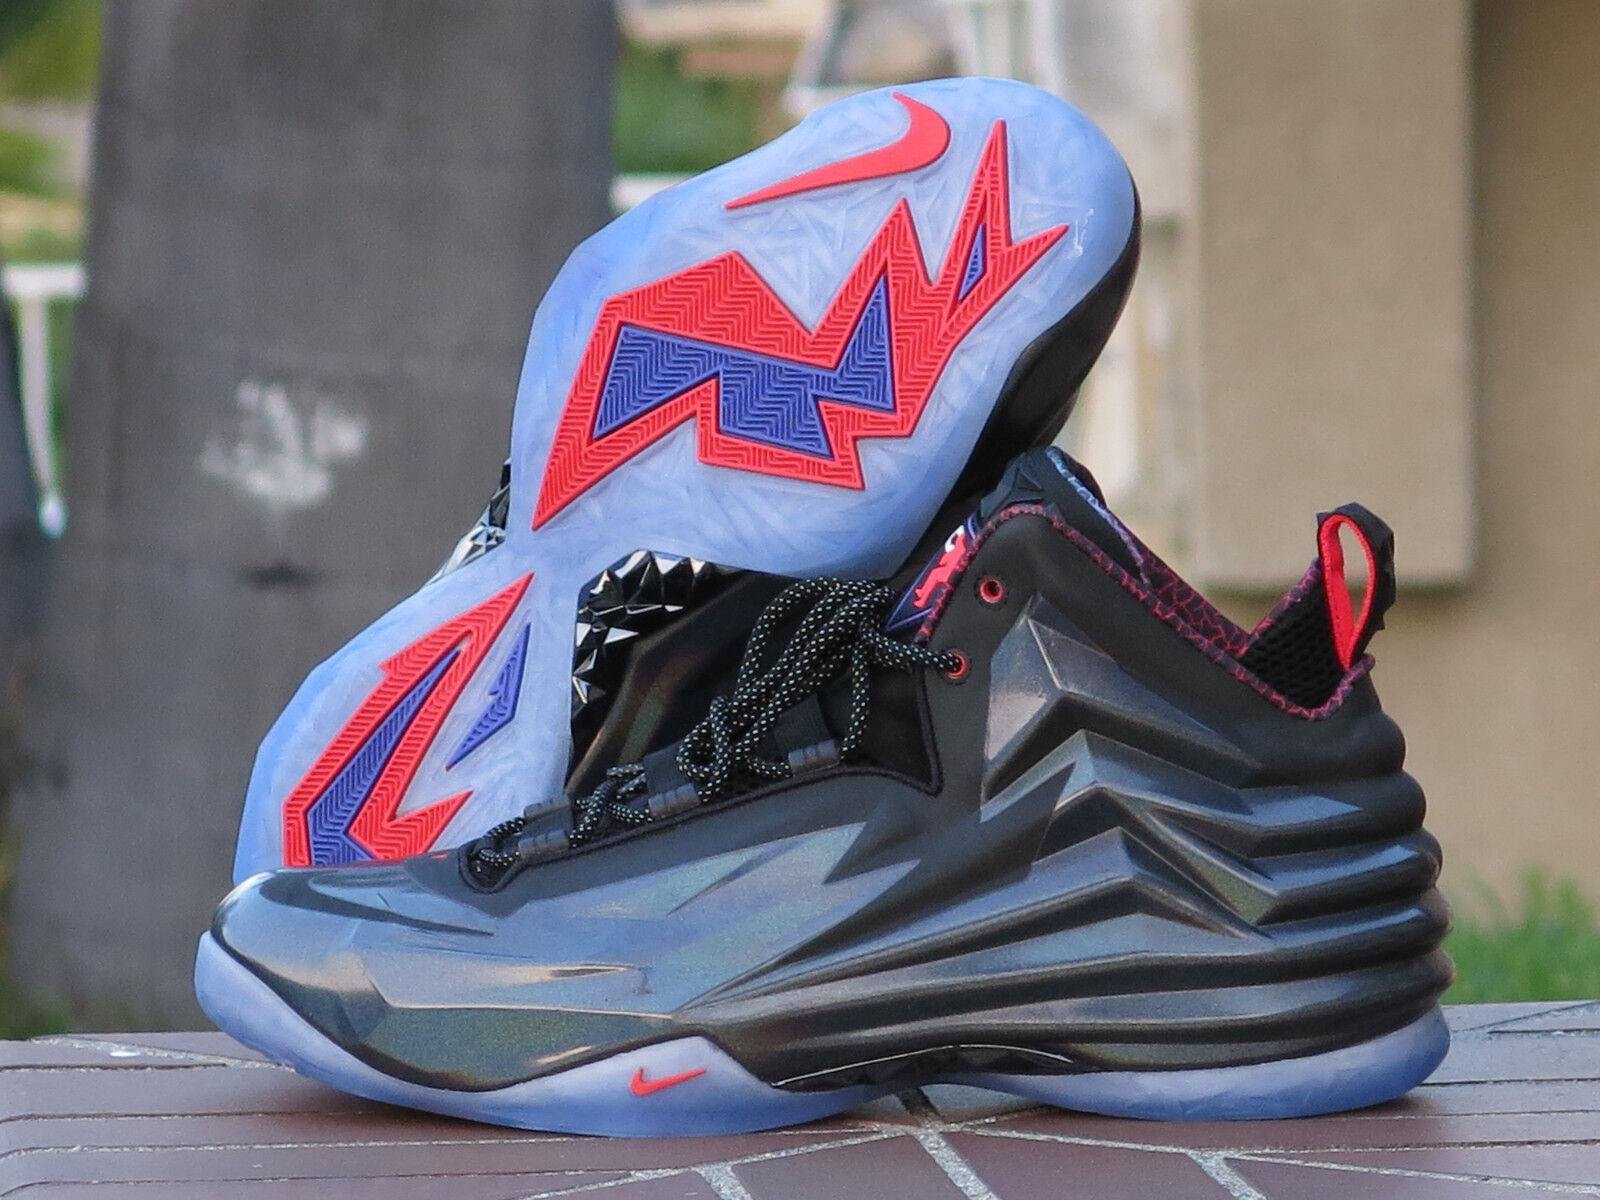 size 40 b457d 7a2c7 2018 Nike Nike Nike Chuck espuma compuesto hombres zapatos de baloncesto  684758-501 reduccion de